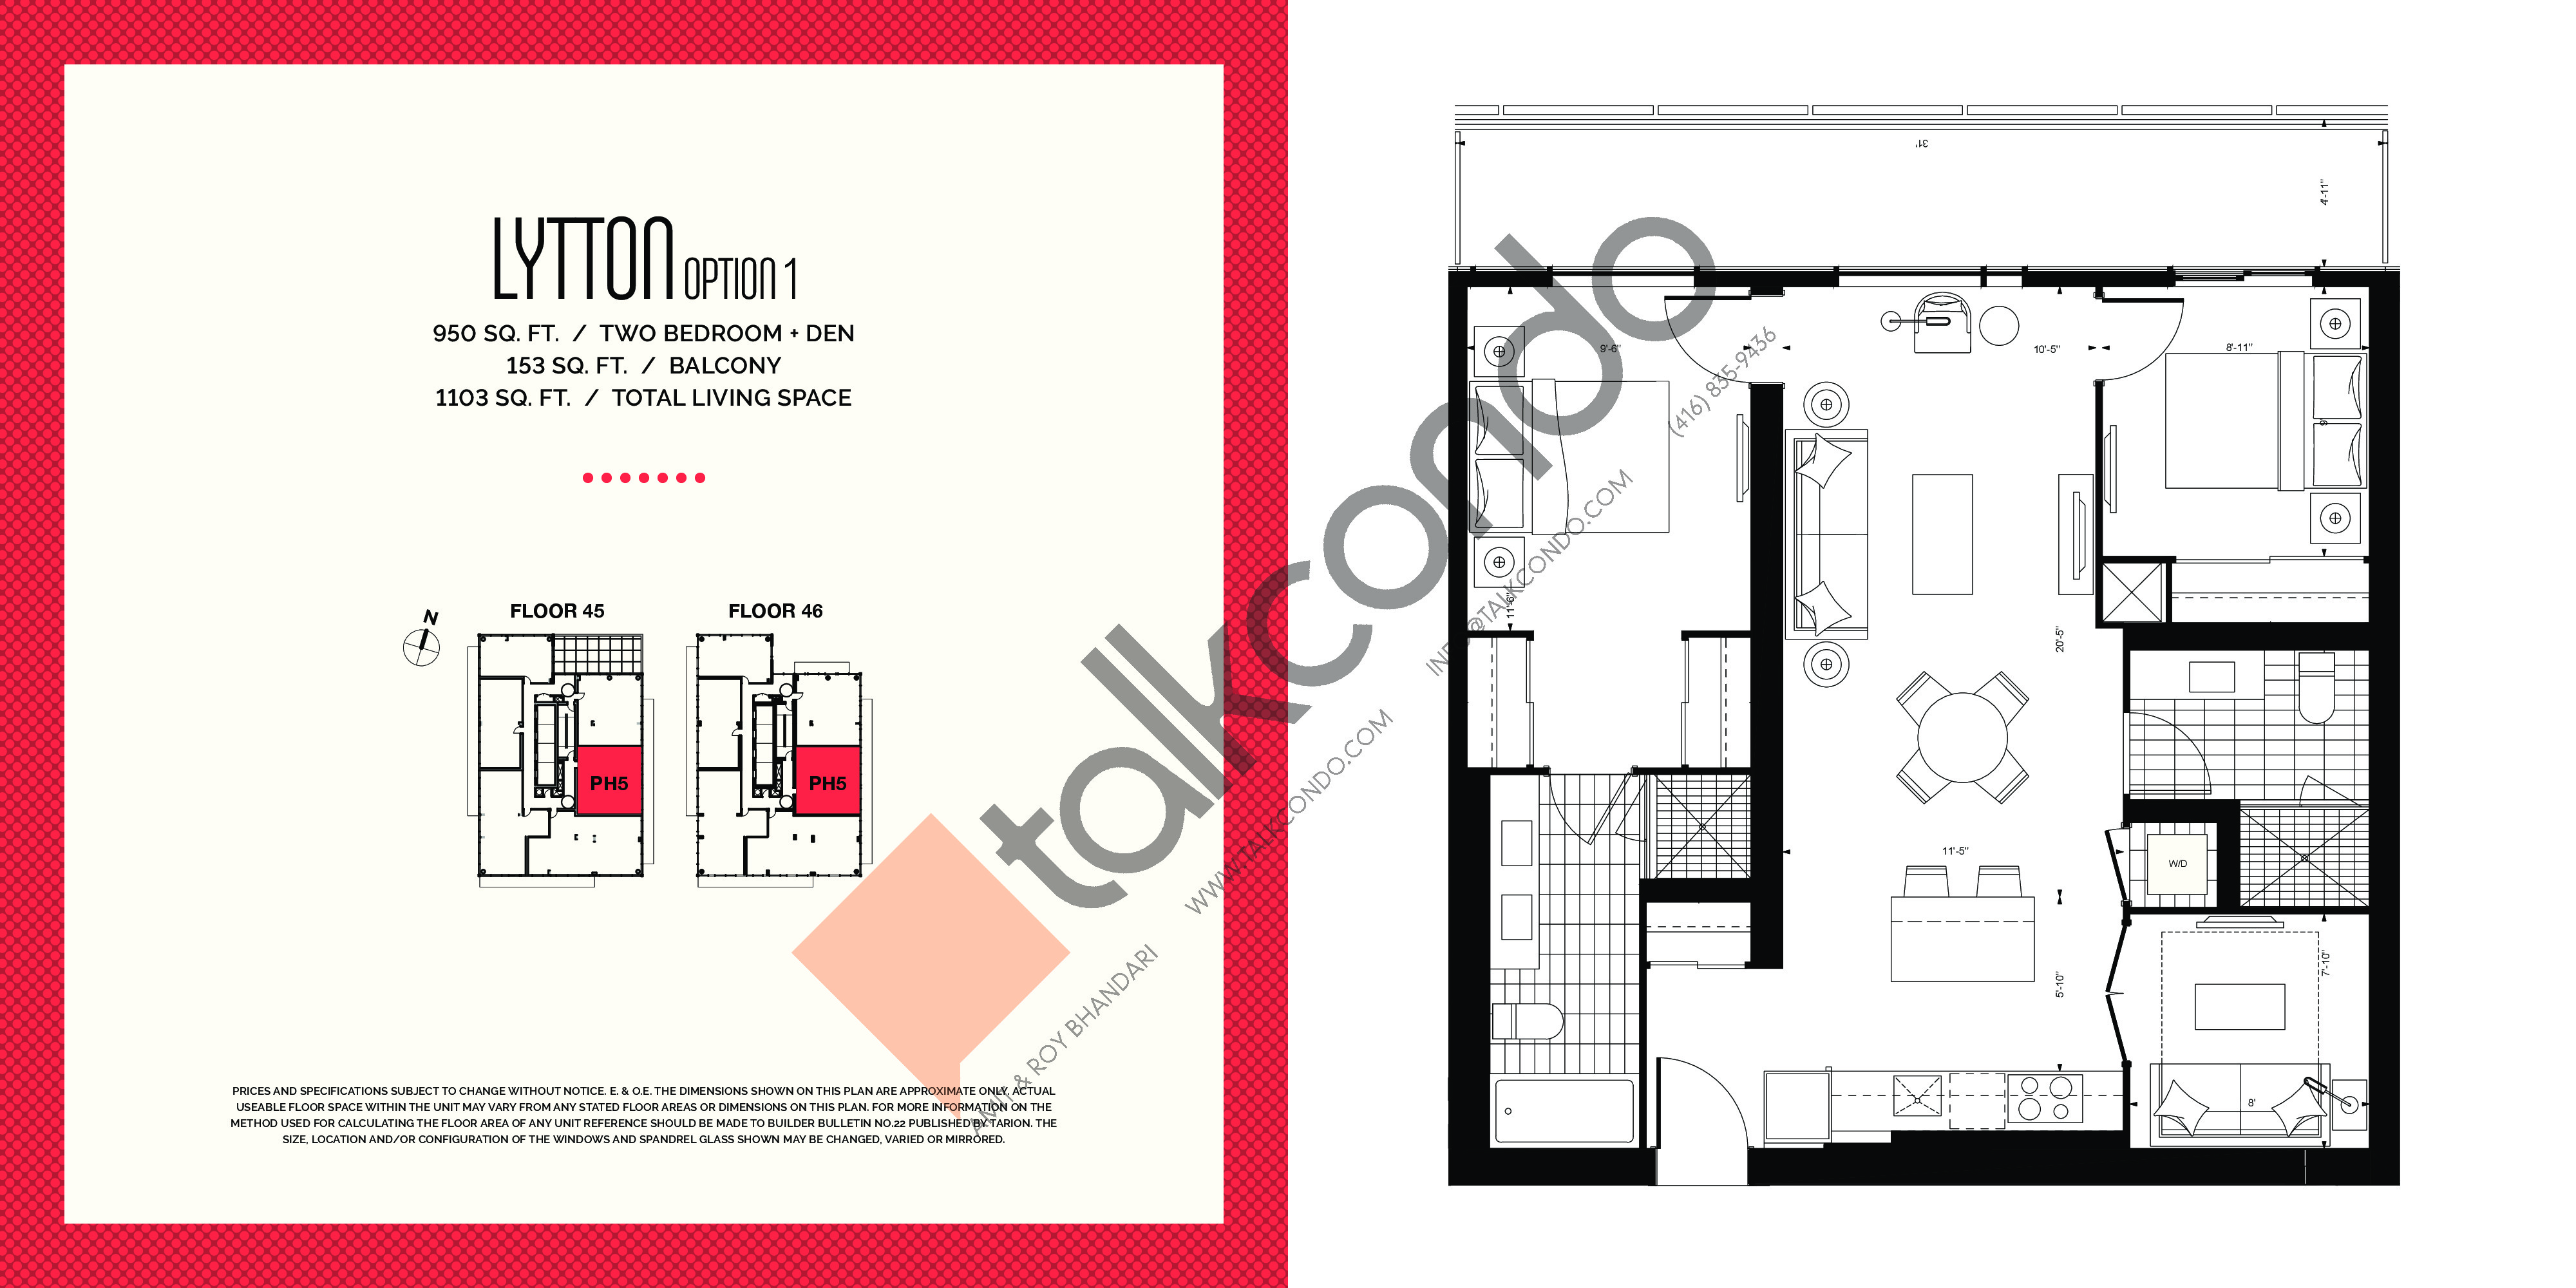 Lytton (Option 1) Floor Plan at E2 Condos - 950 sq.ft